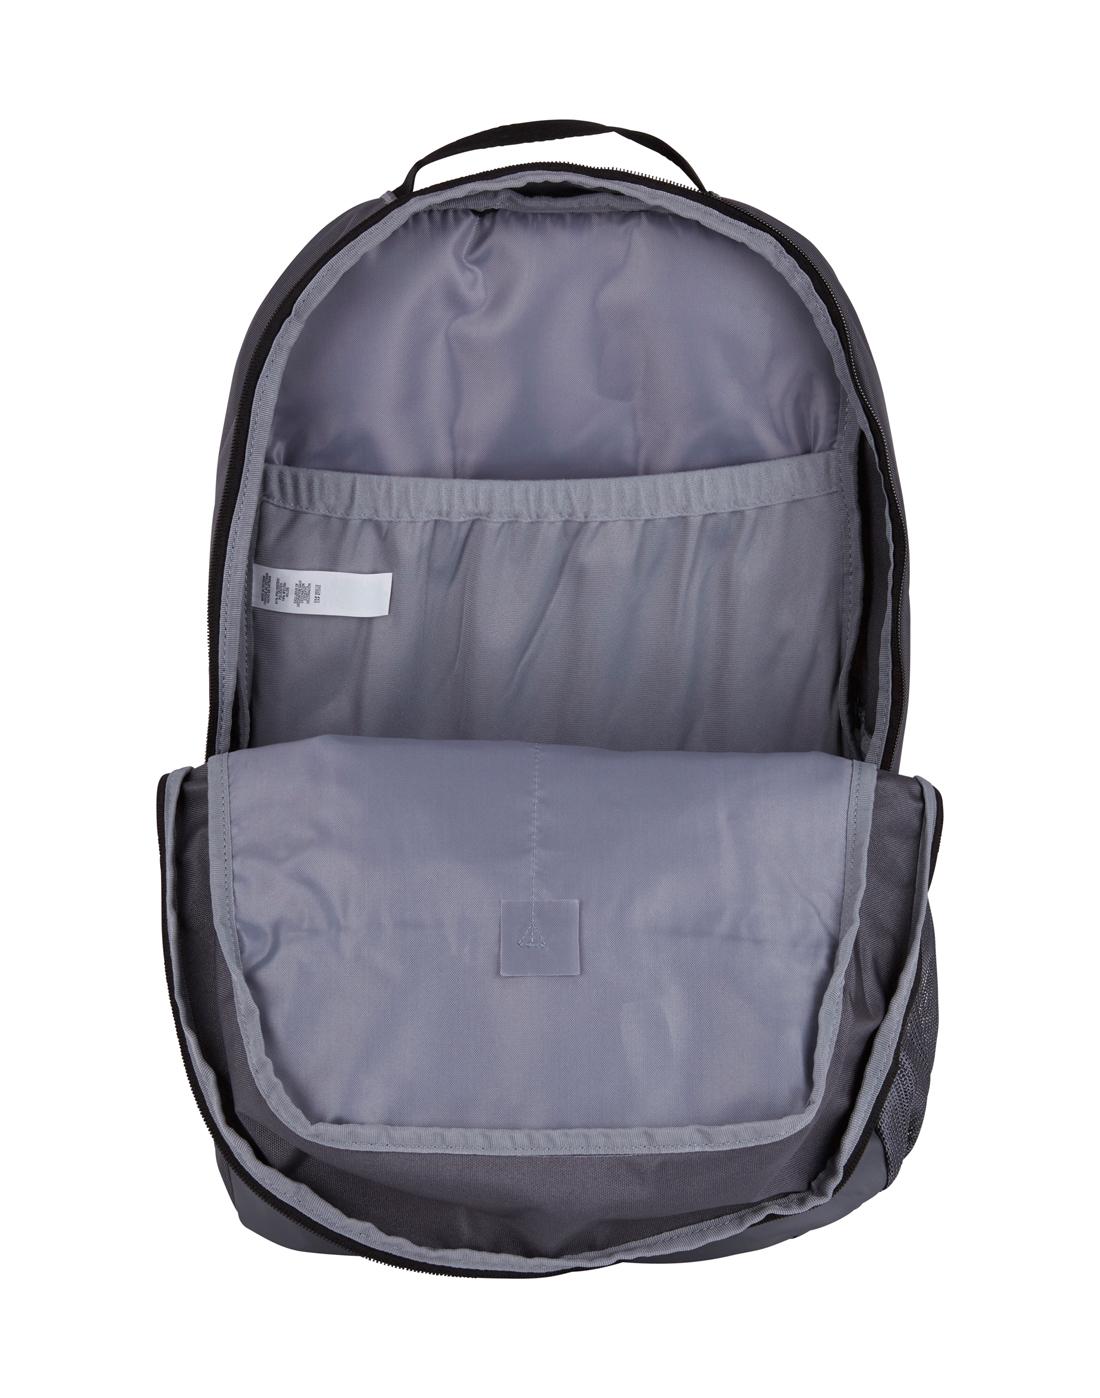 Under Armour. Hustle Lite Backpack. Hustle Lite Backpack · Hustle Lite  Backpack · Hustle Lite Backpack ... dc20562e6a21a